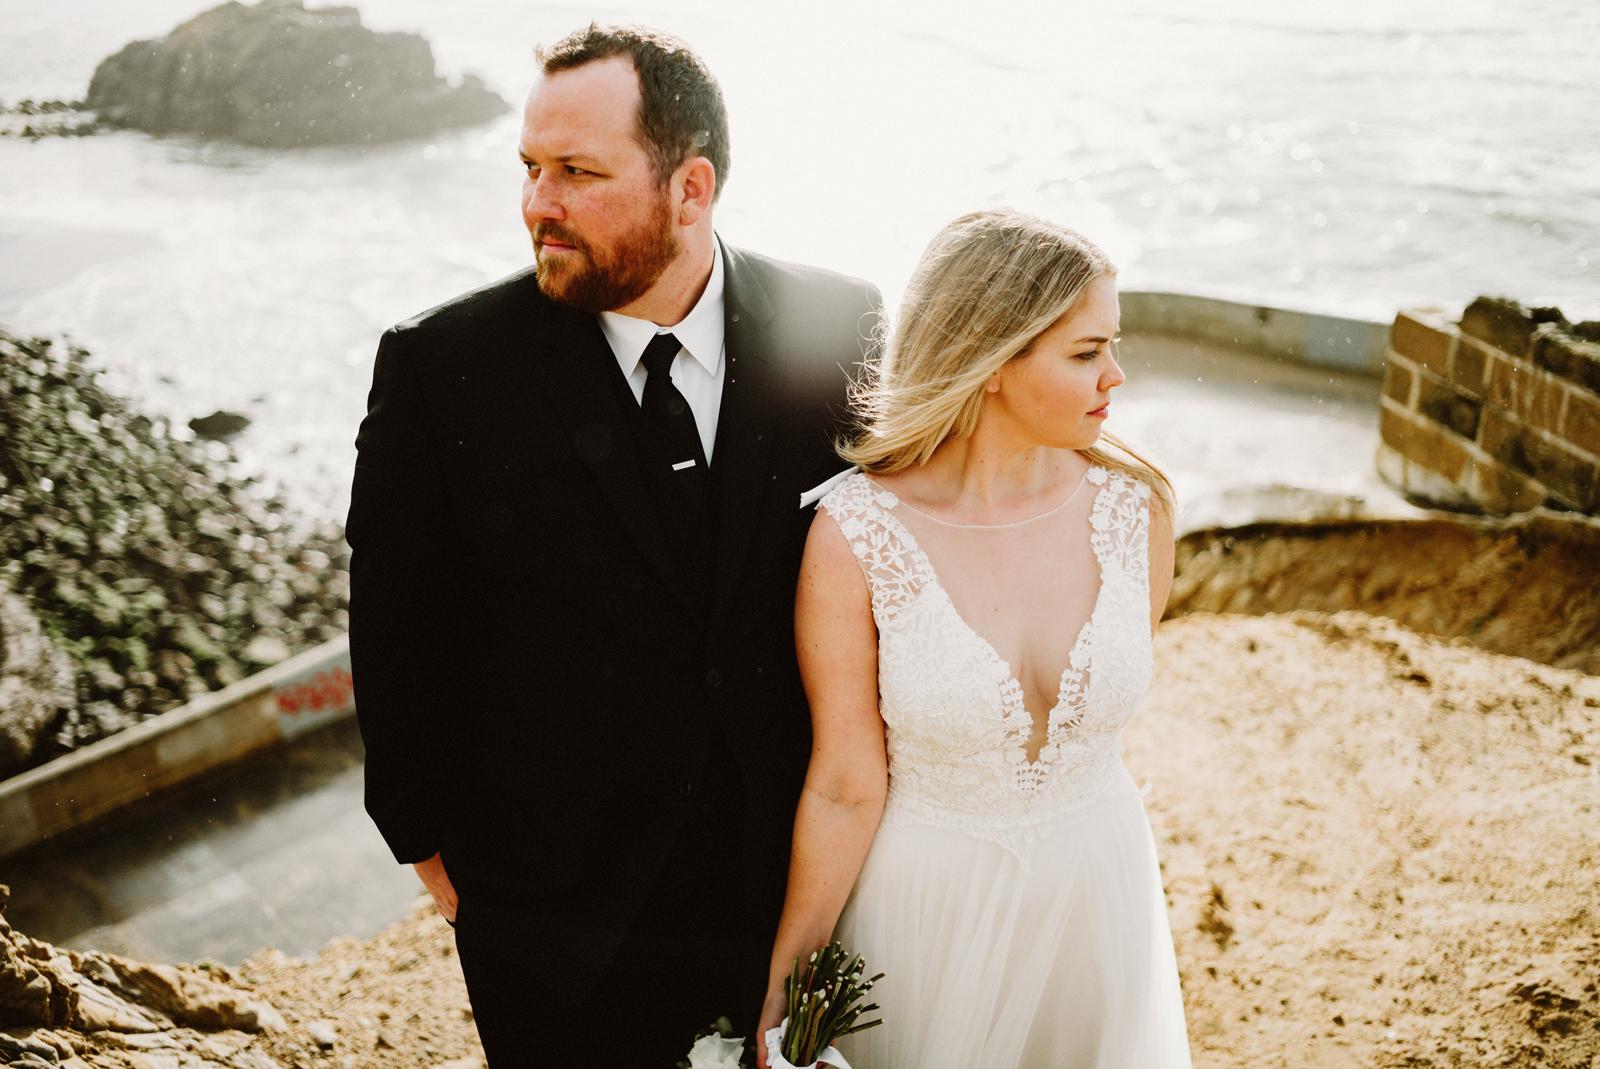 san-francisco-city-hall-elopement-45 SAN FRANCISCO CITY HALL INTIMATE WEDDING